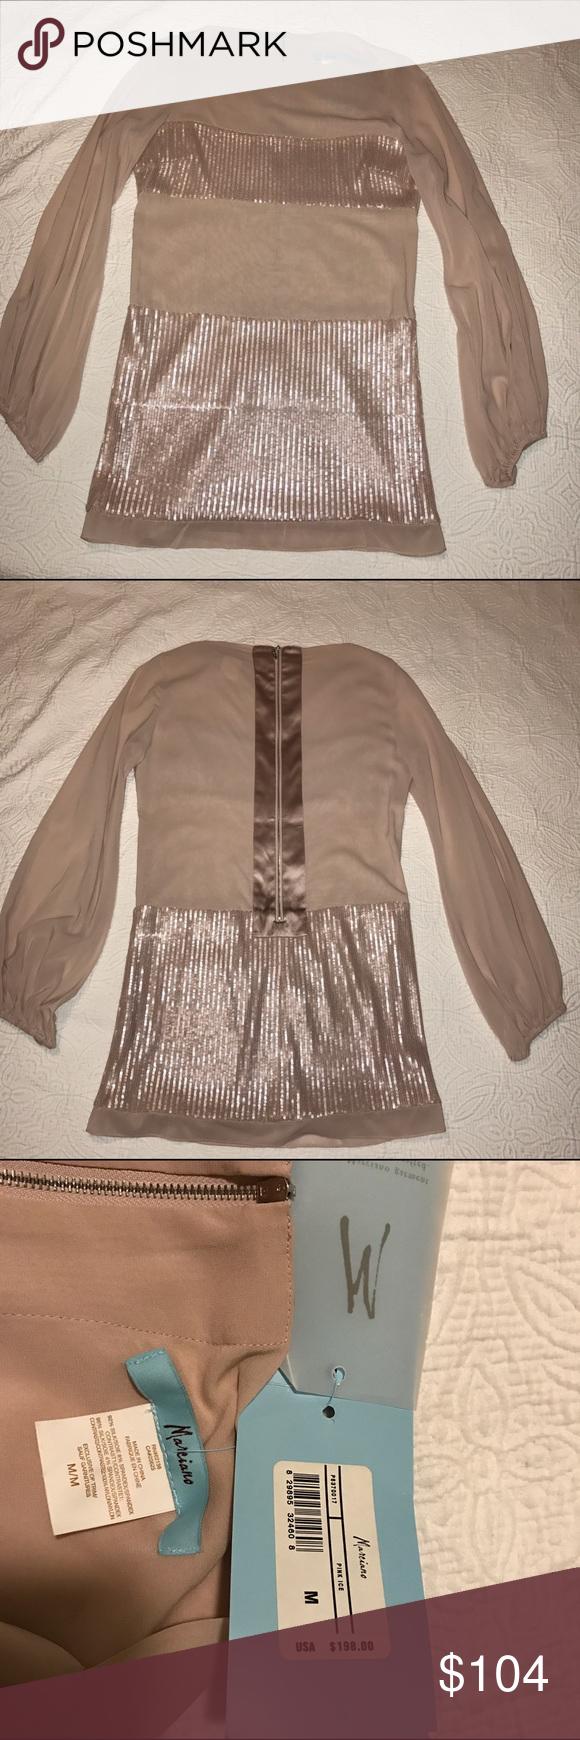 Marciano pink ice mini dress